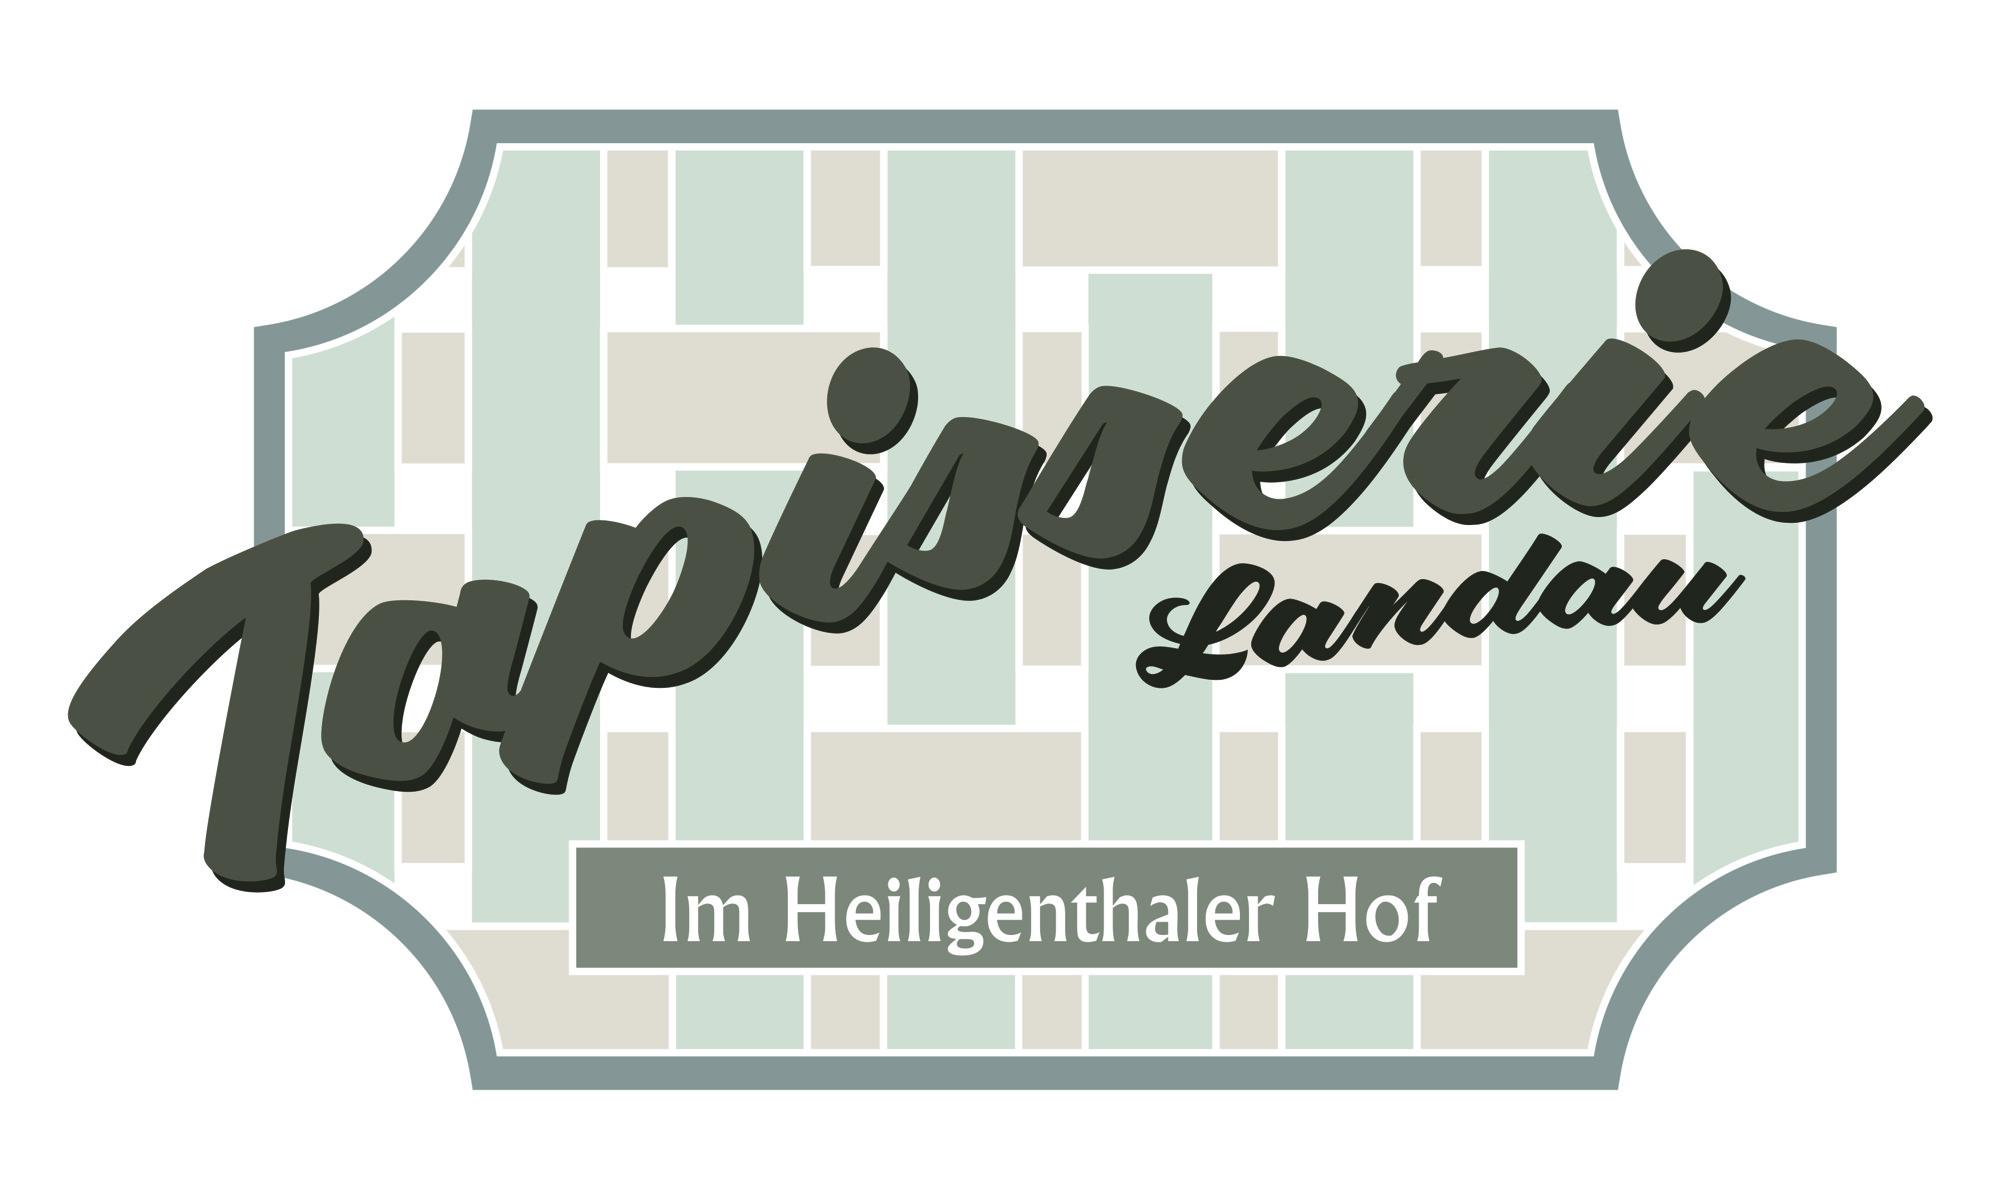 Tapisserie Landau Logo